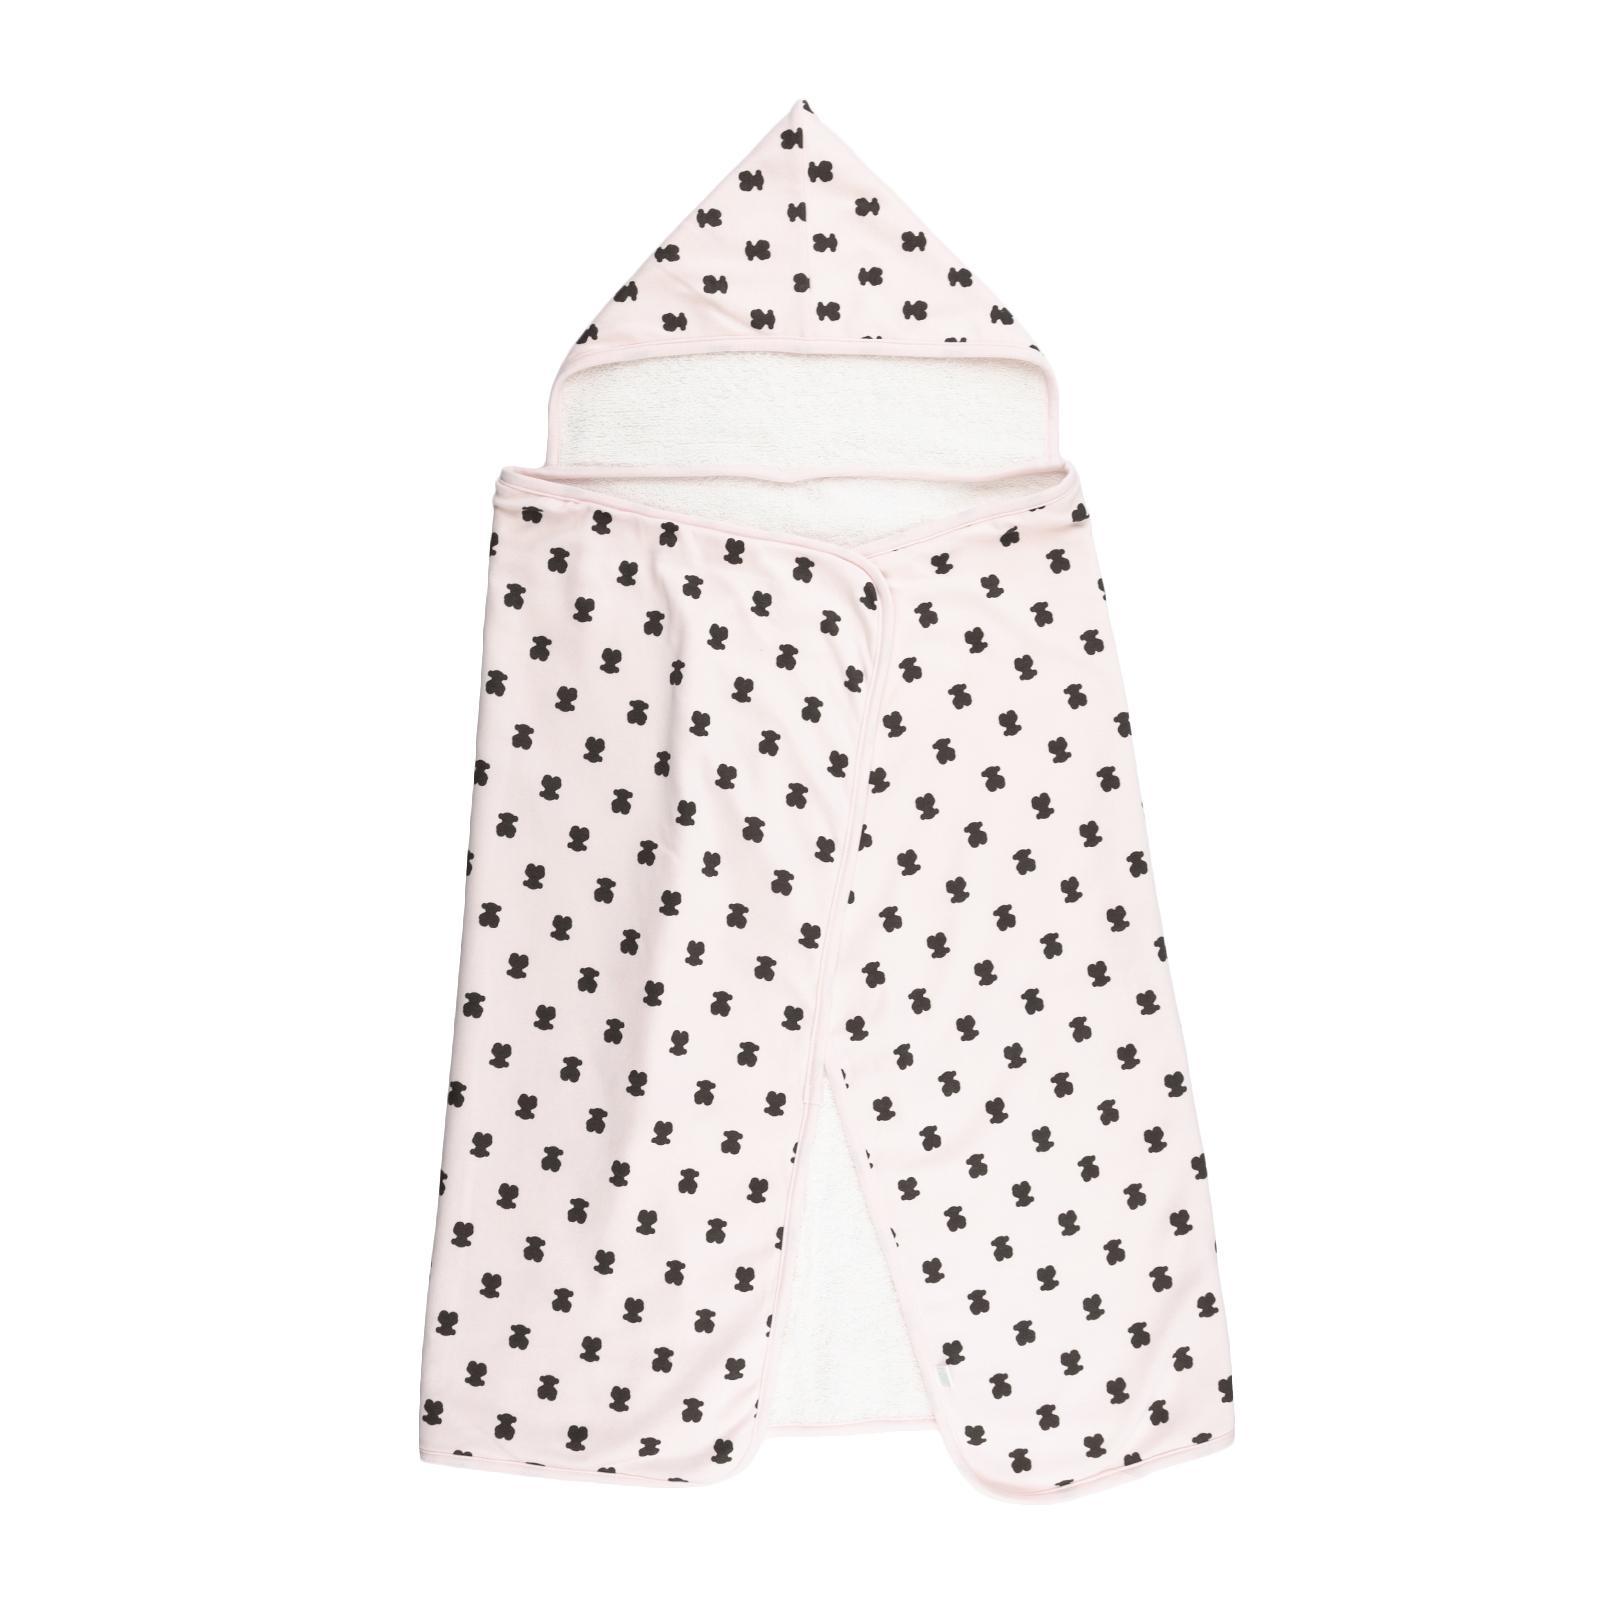 Capa de Baño Capucha Baby Tous mod. MuBear color rosa.